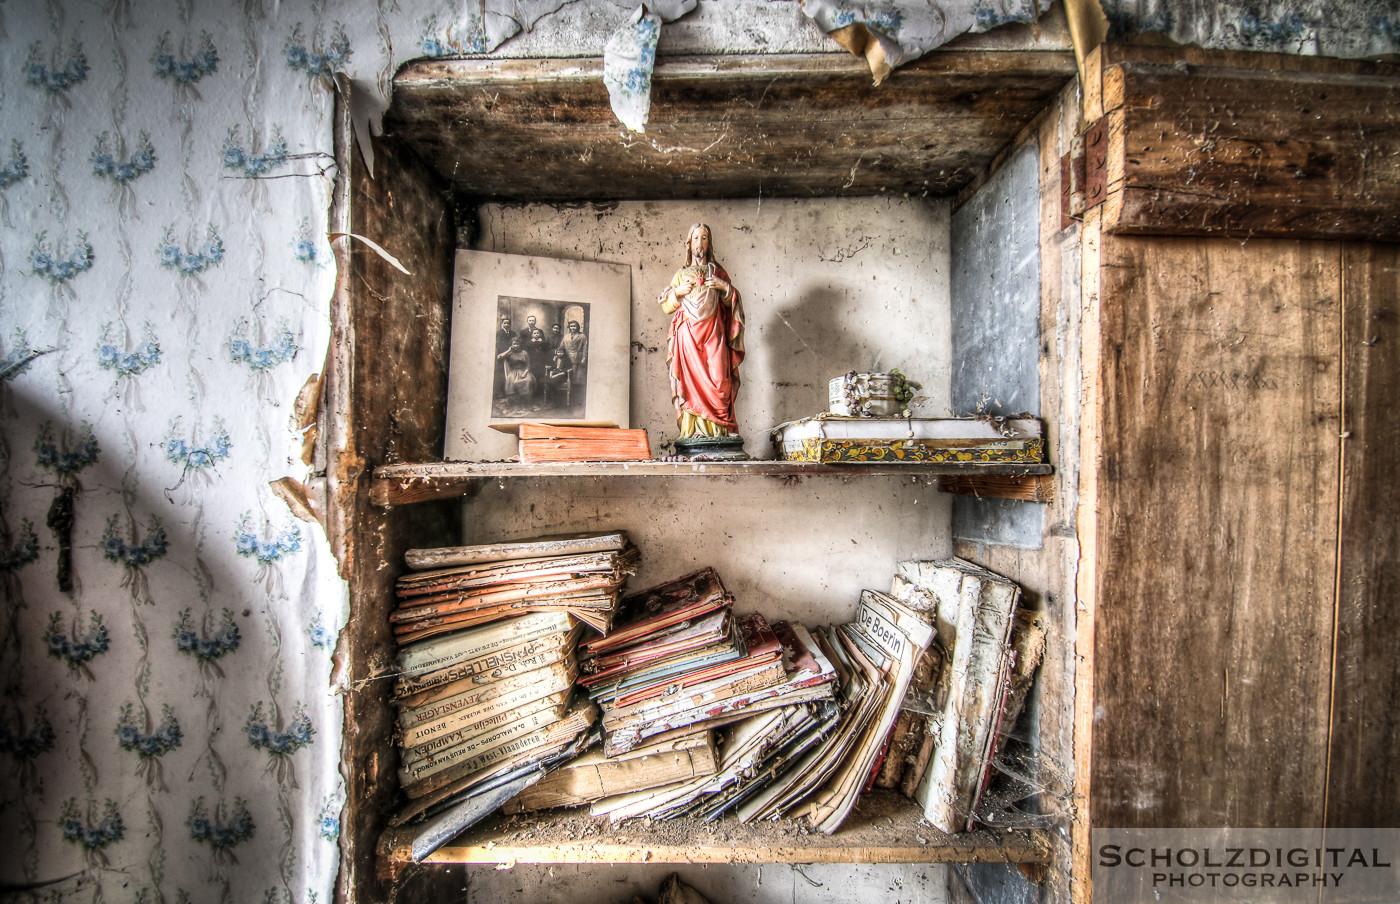 Abandoned, Decay, Lost Place, Urban exploration, Urbex, verlassen, Verlassene Orte, urbexlocatie, beelden, urban exploration, lost place, abandoned, forgotten, Ferme St Valentine. Belgie, Farm bauernhof